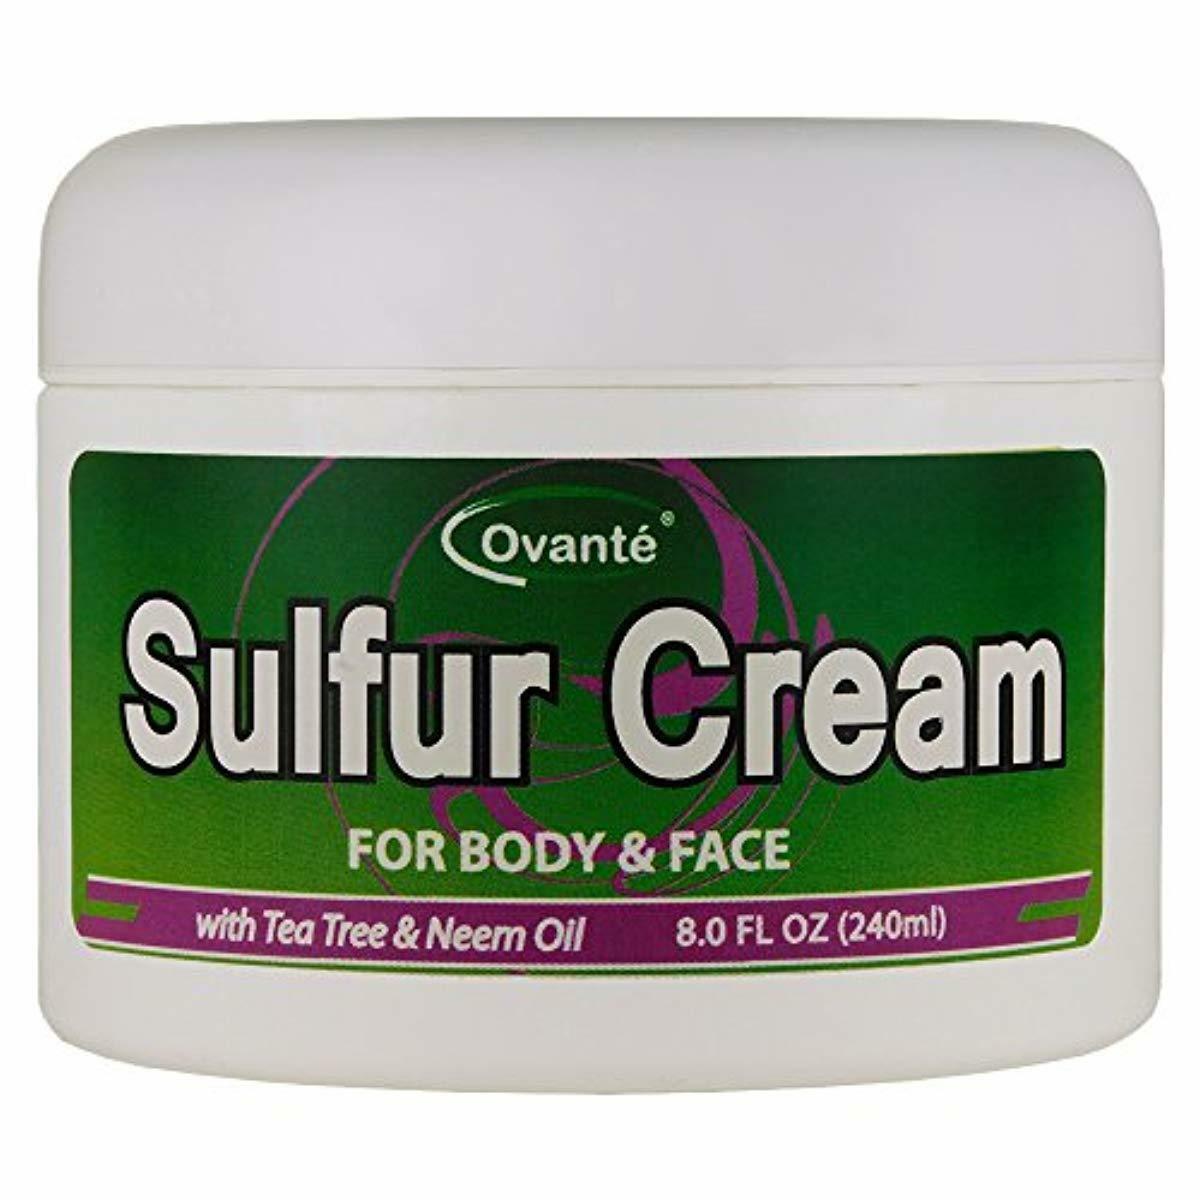 sulfur skin cream 8 oz 240 ml